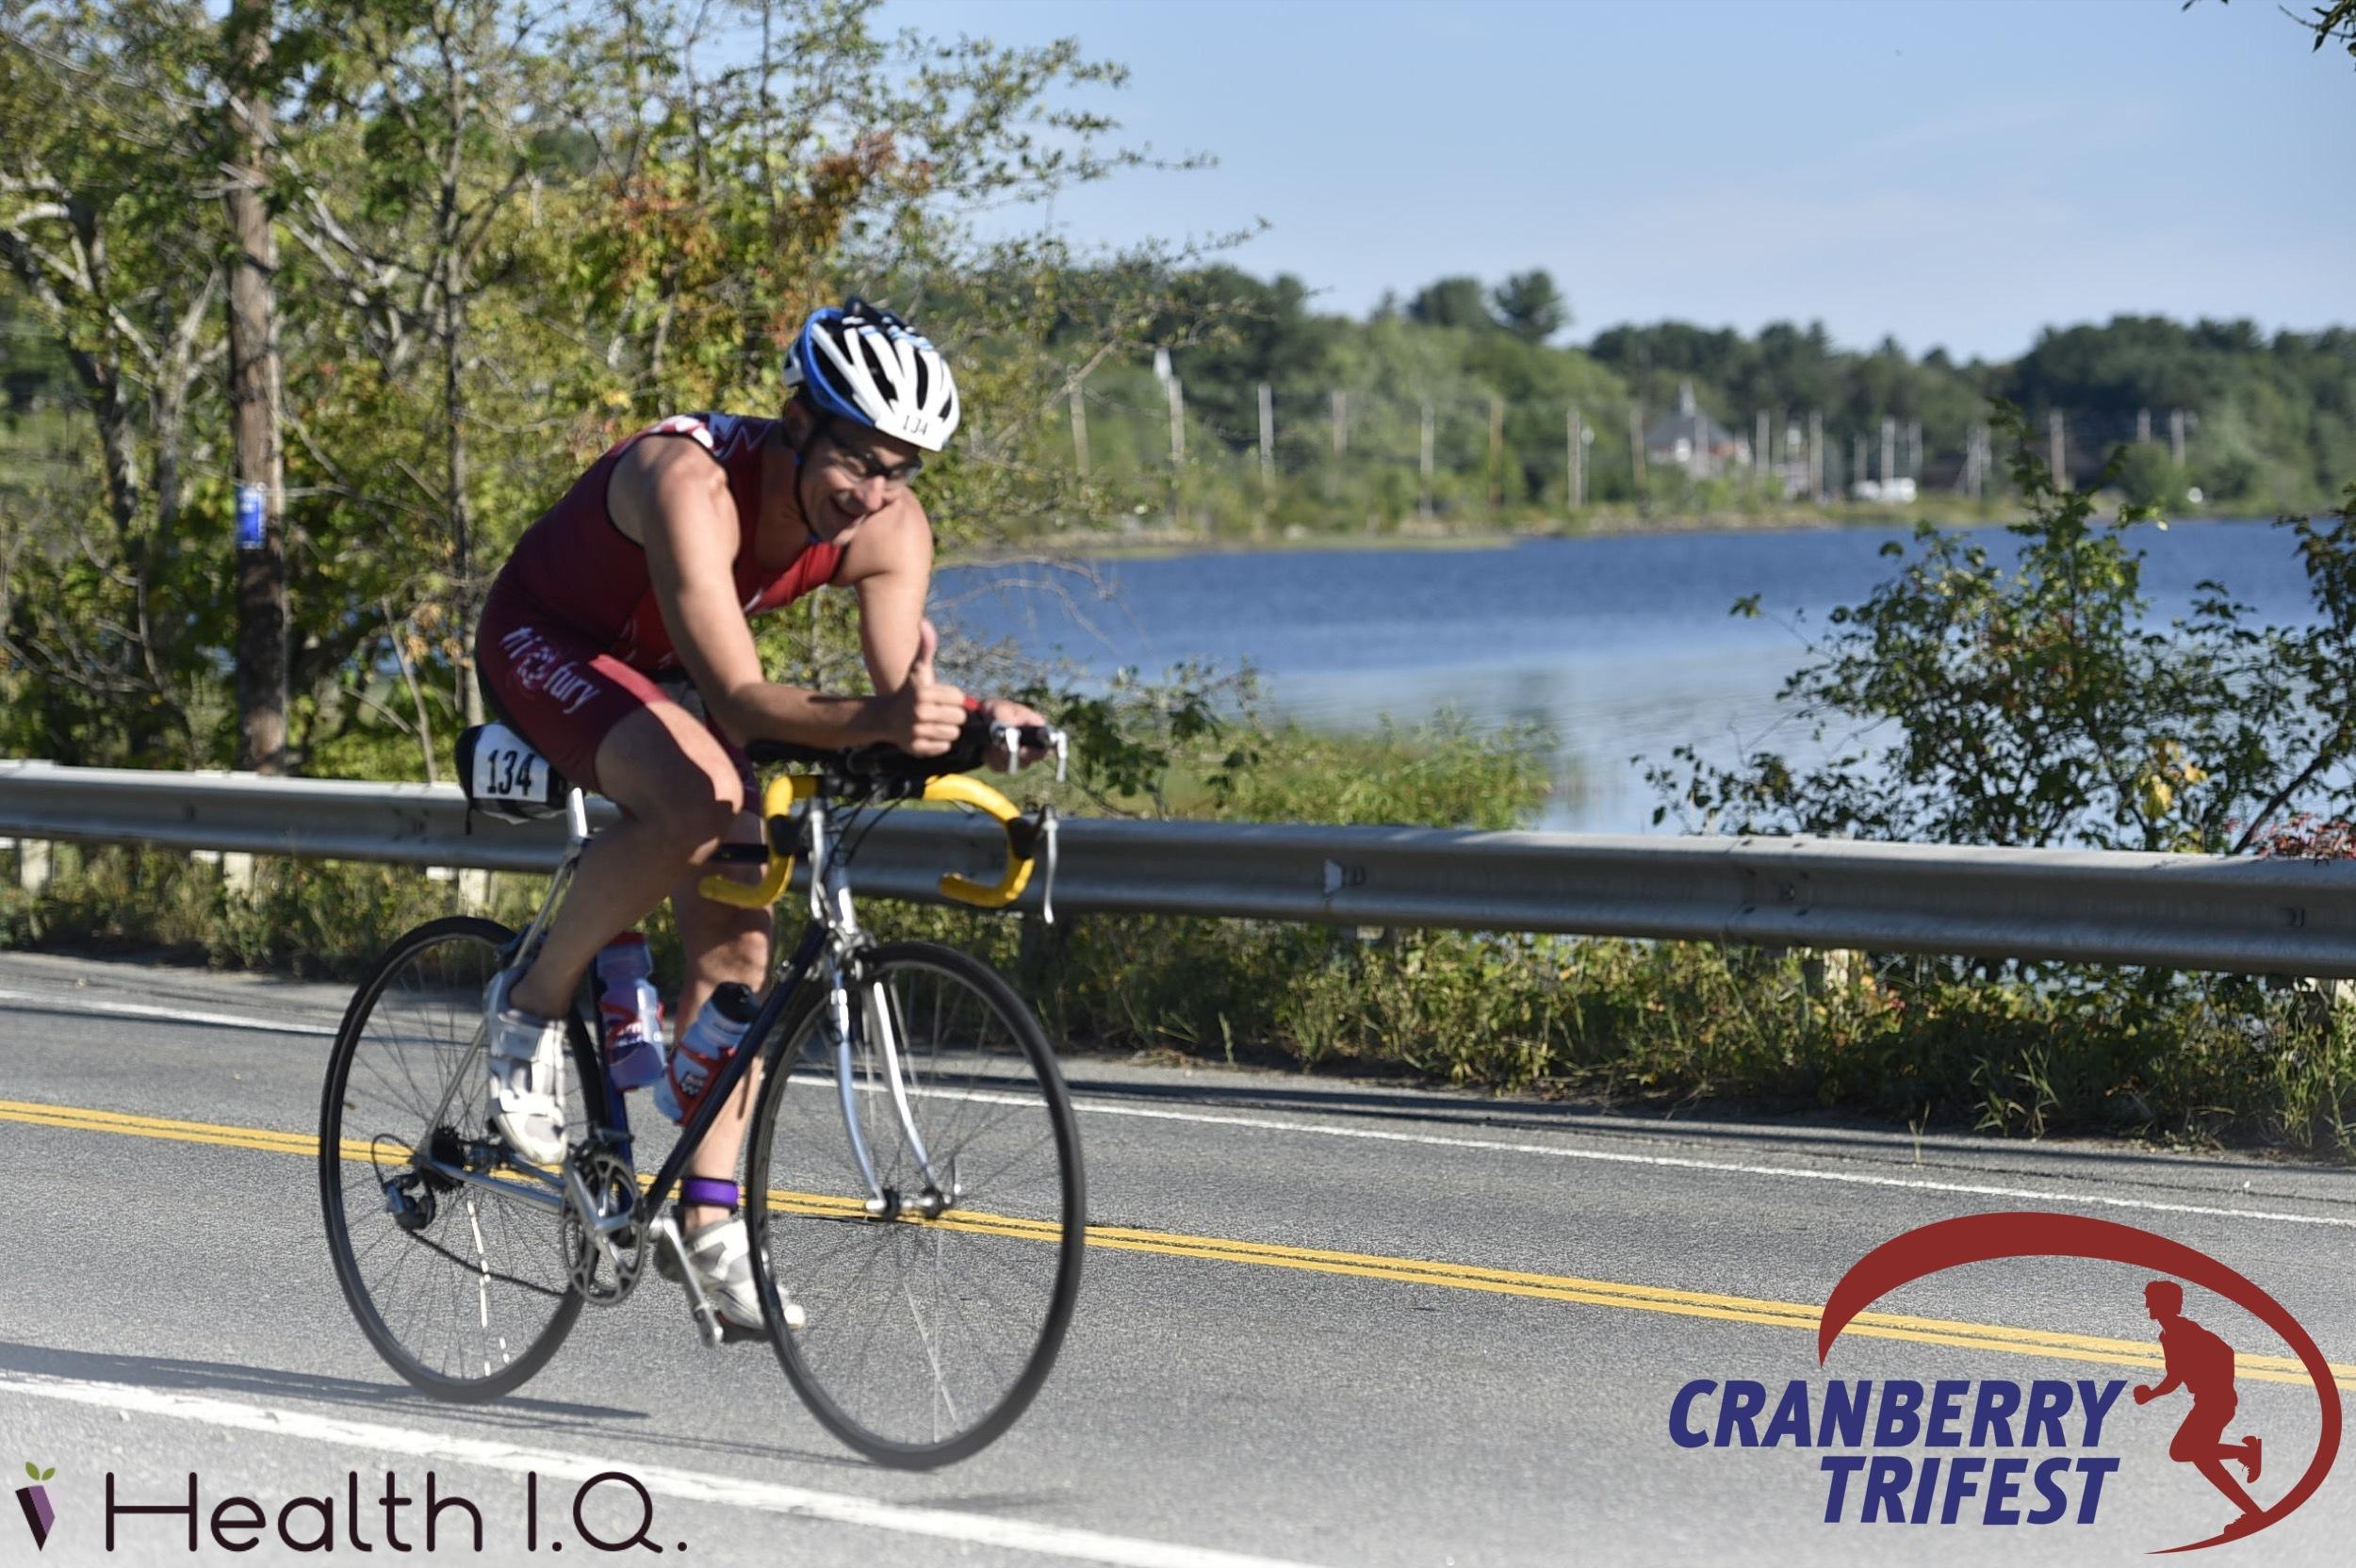 Cranberry Bike